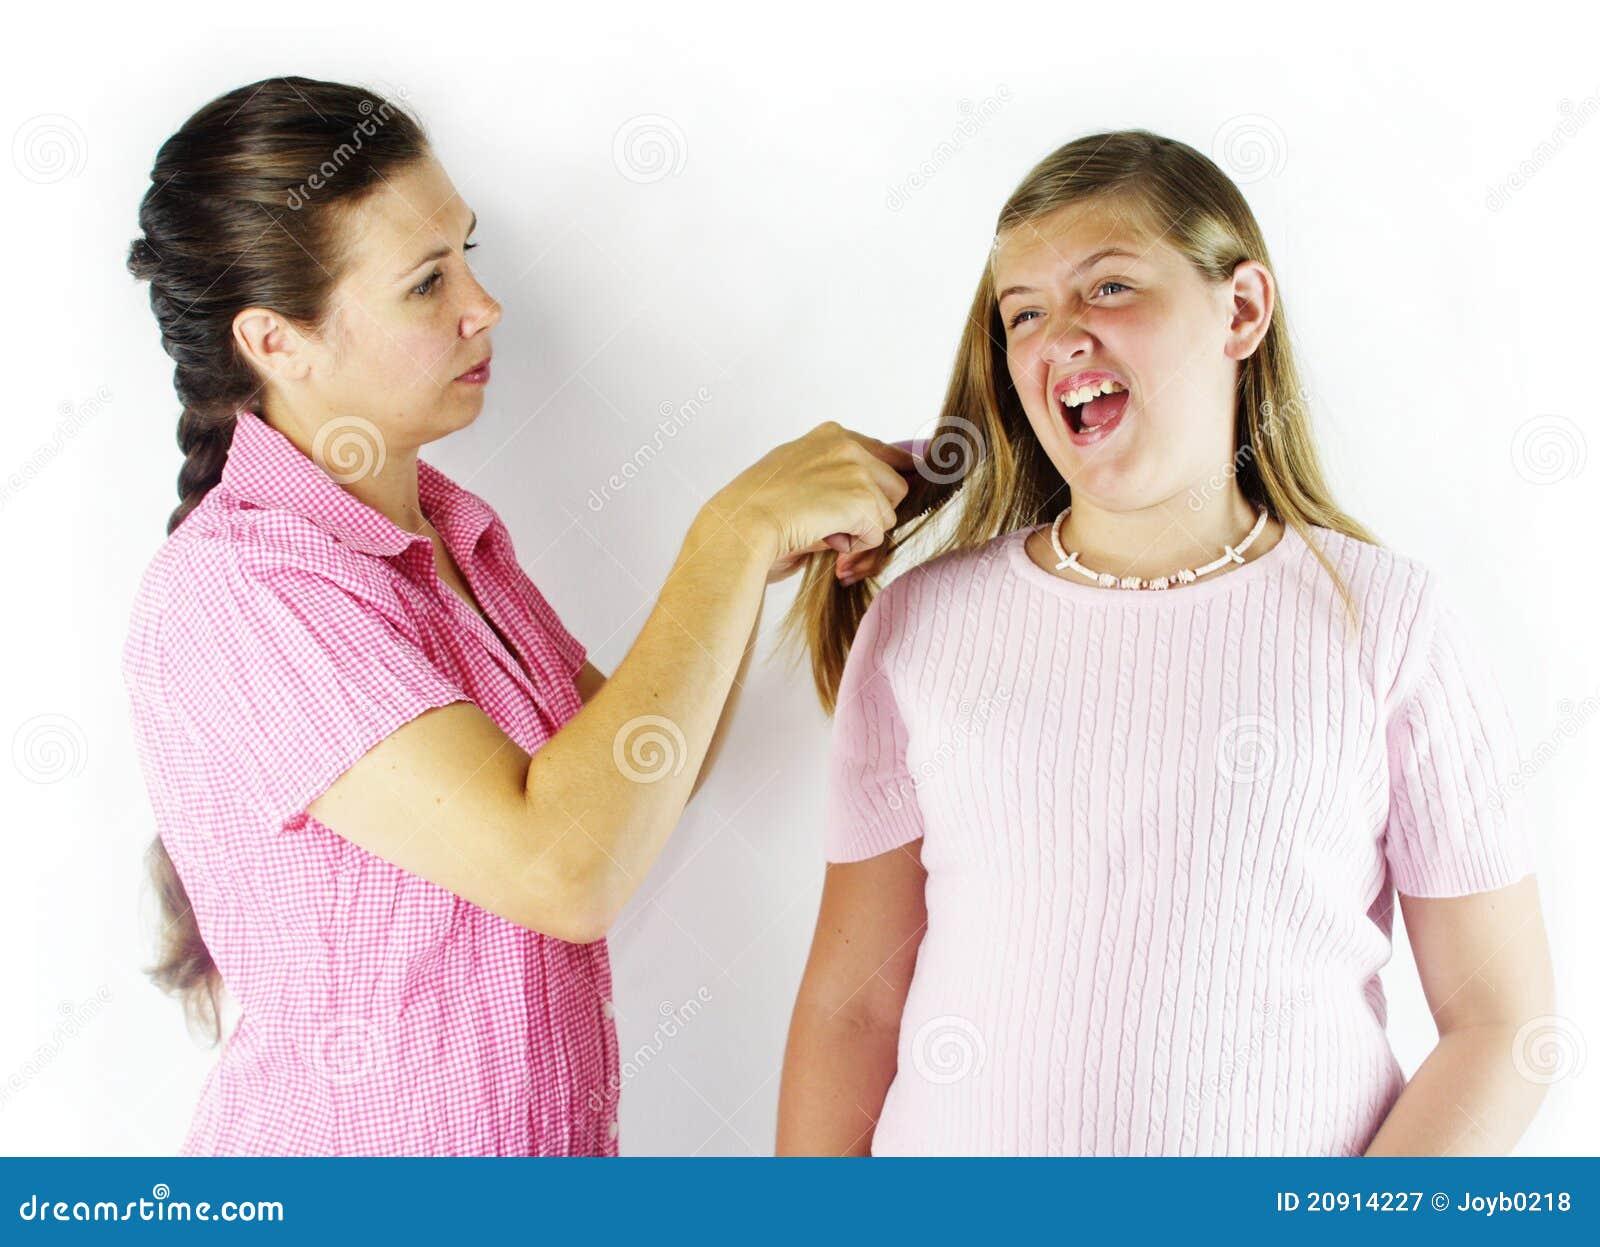 Horrible Hair Brushing